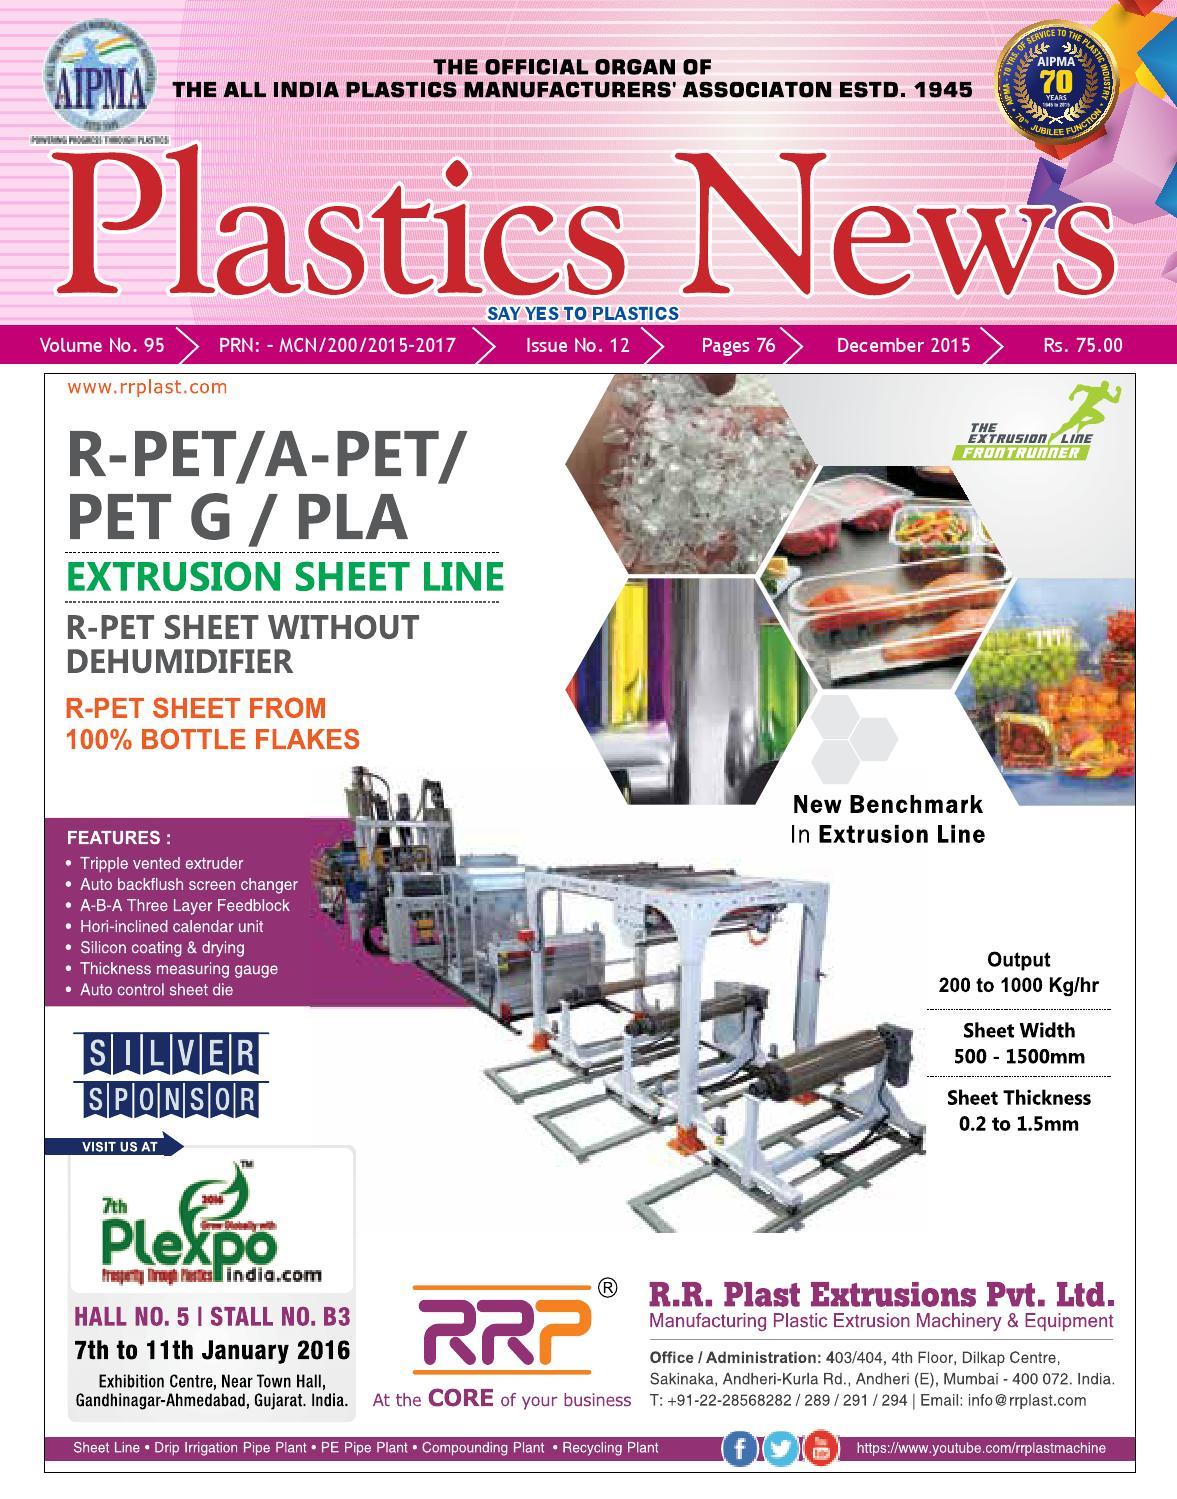 Plastic news dec 2015 by aipma - issuu